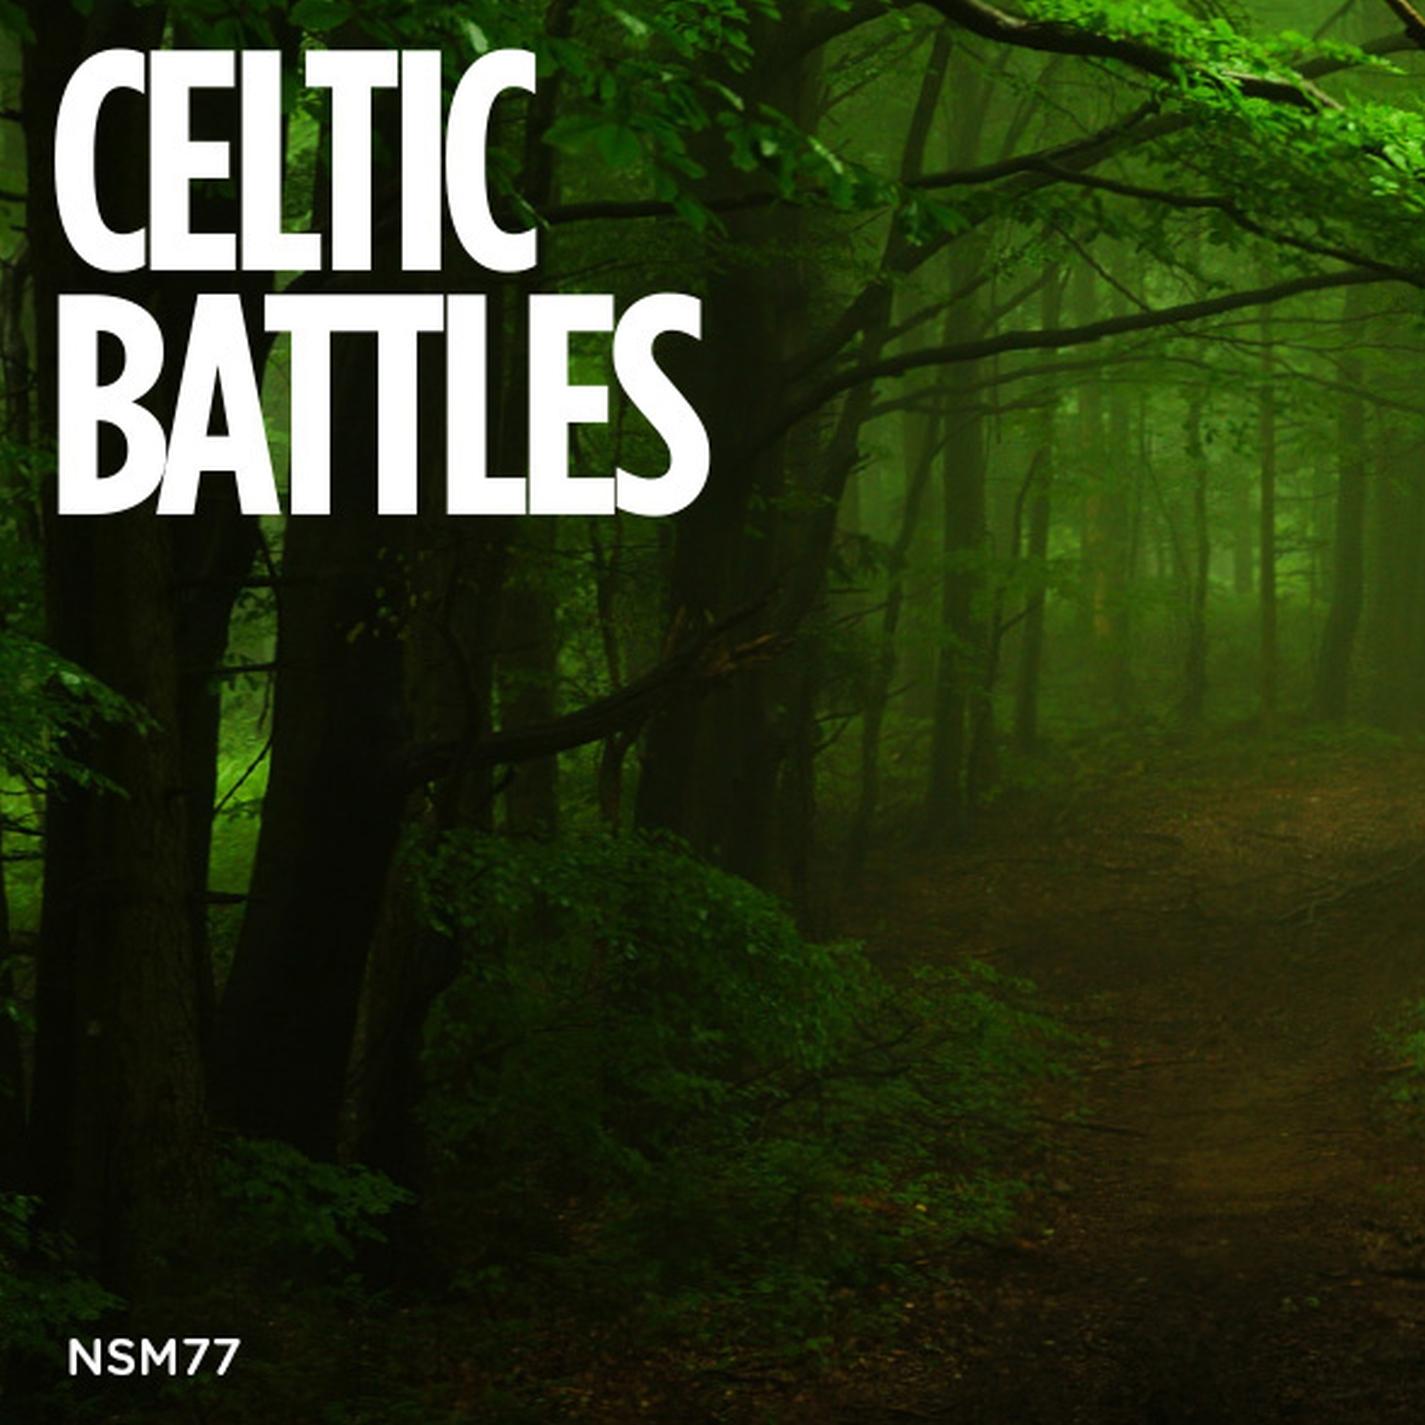 Celtic Battles